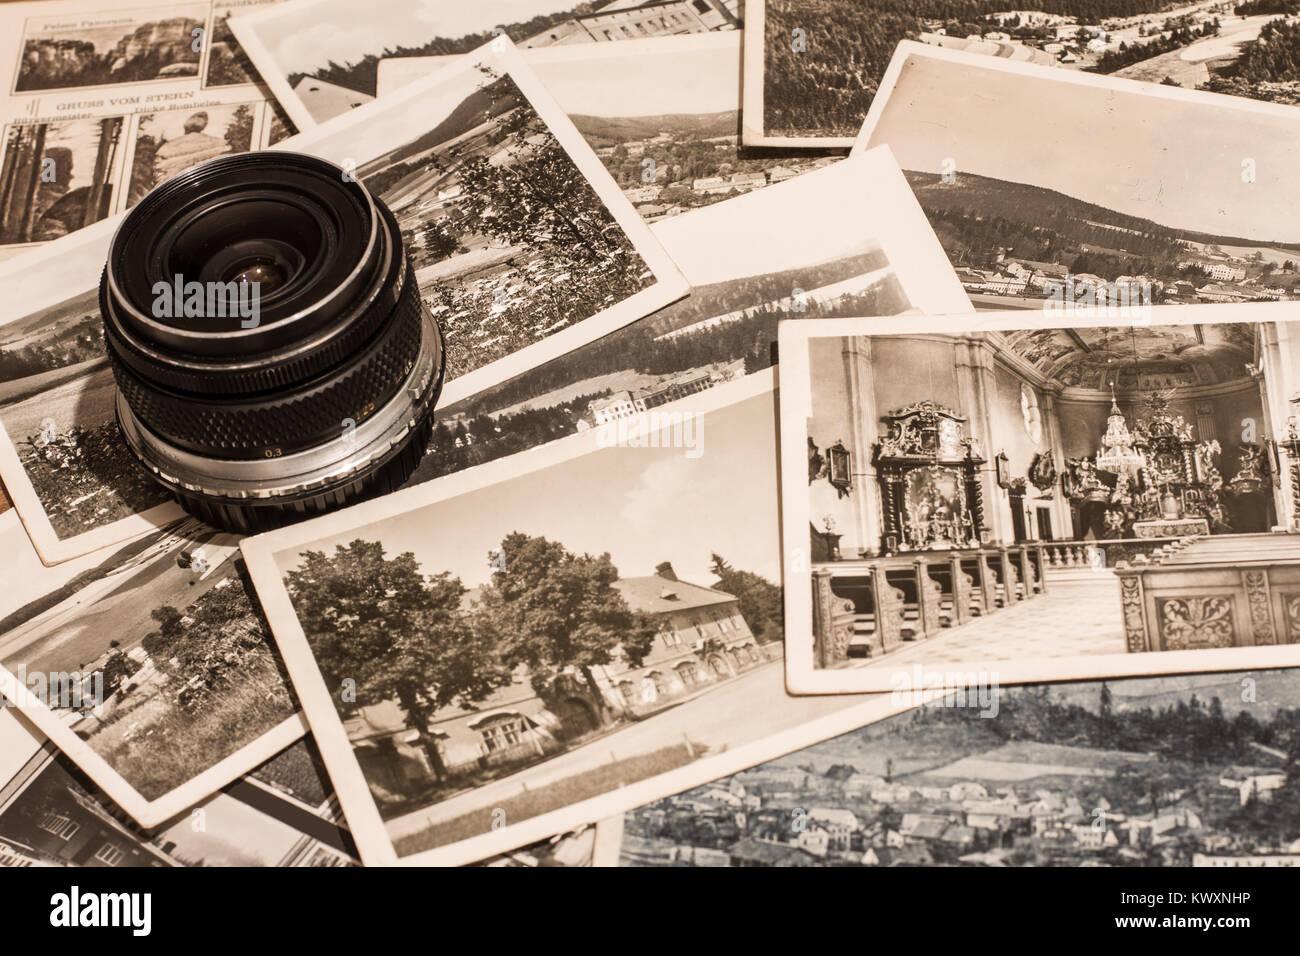 Vintage postcards and old camera lens - Stock Image